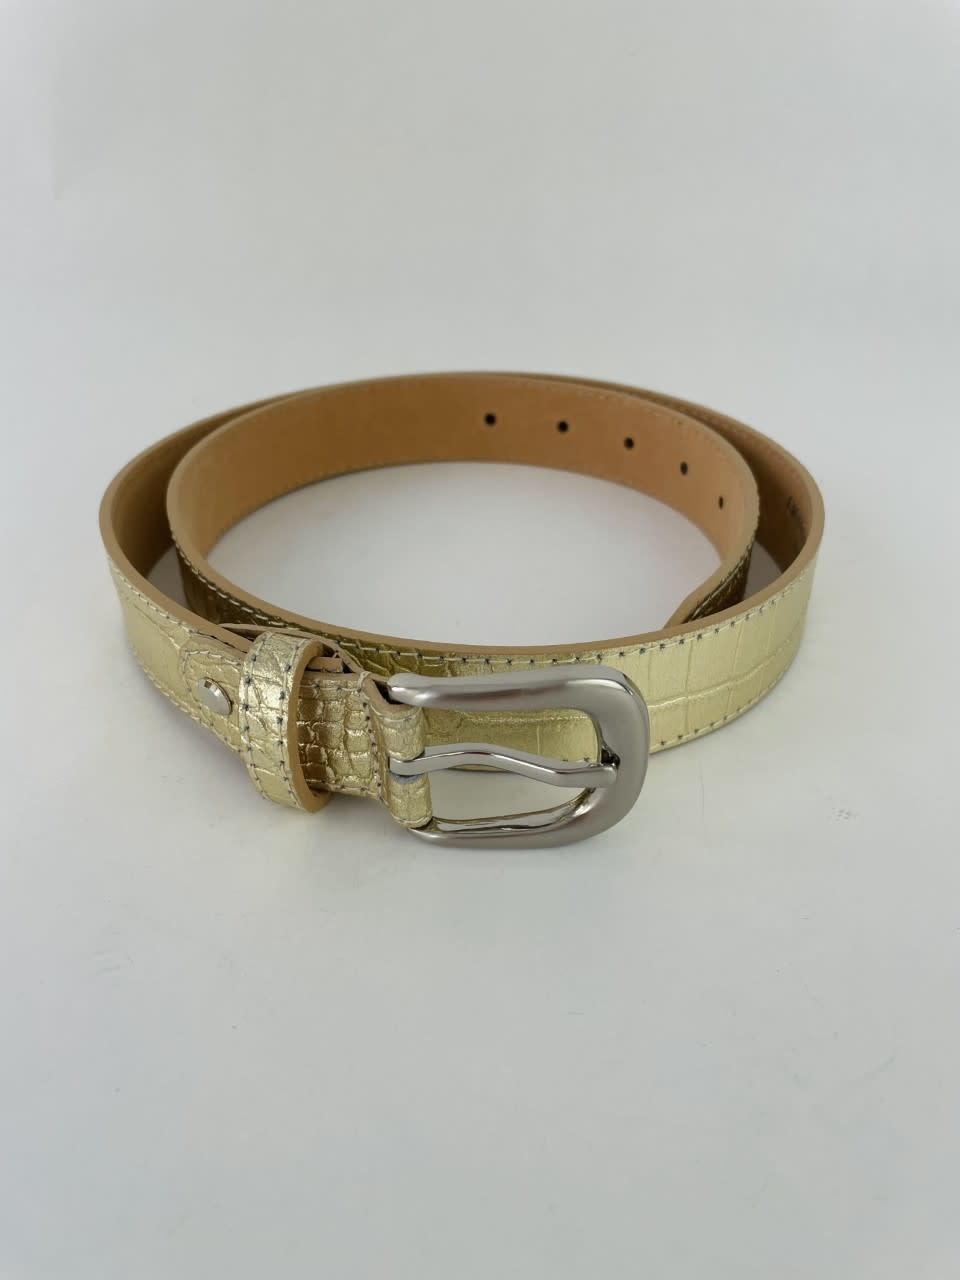 Onida leather croco belt Gold-2